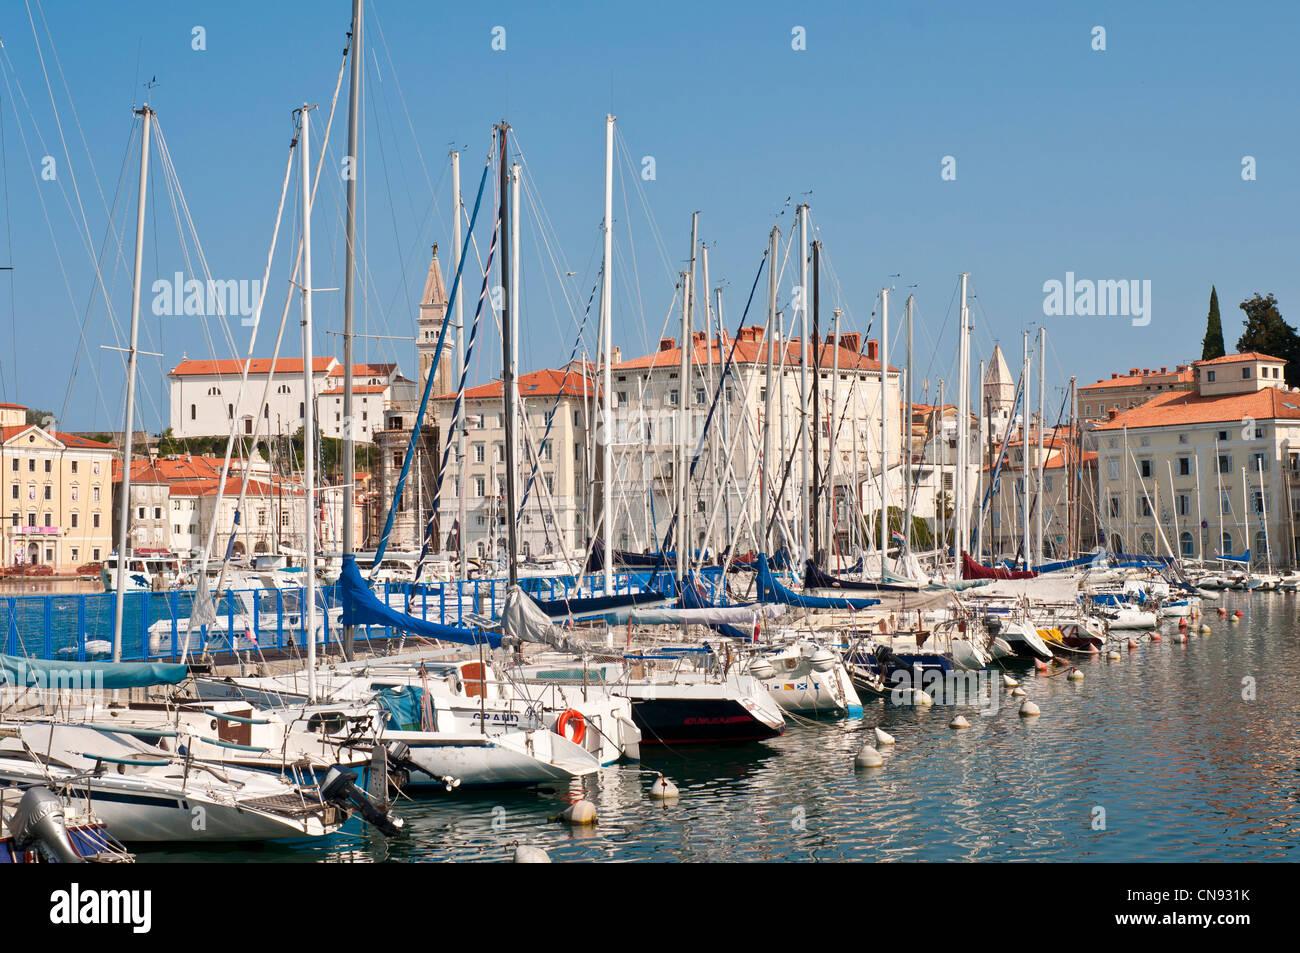 Slovenia, Gulf of Trieste, Adriatic Coast, Primorska Region, Piran, the harbour - Stock Image